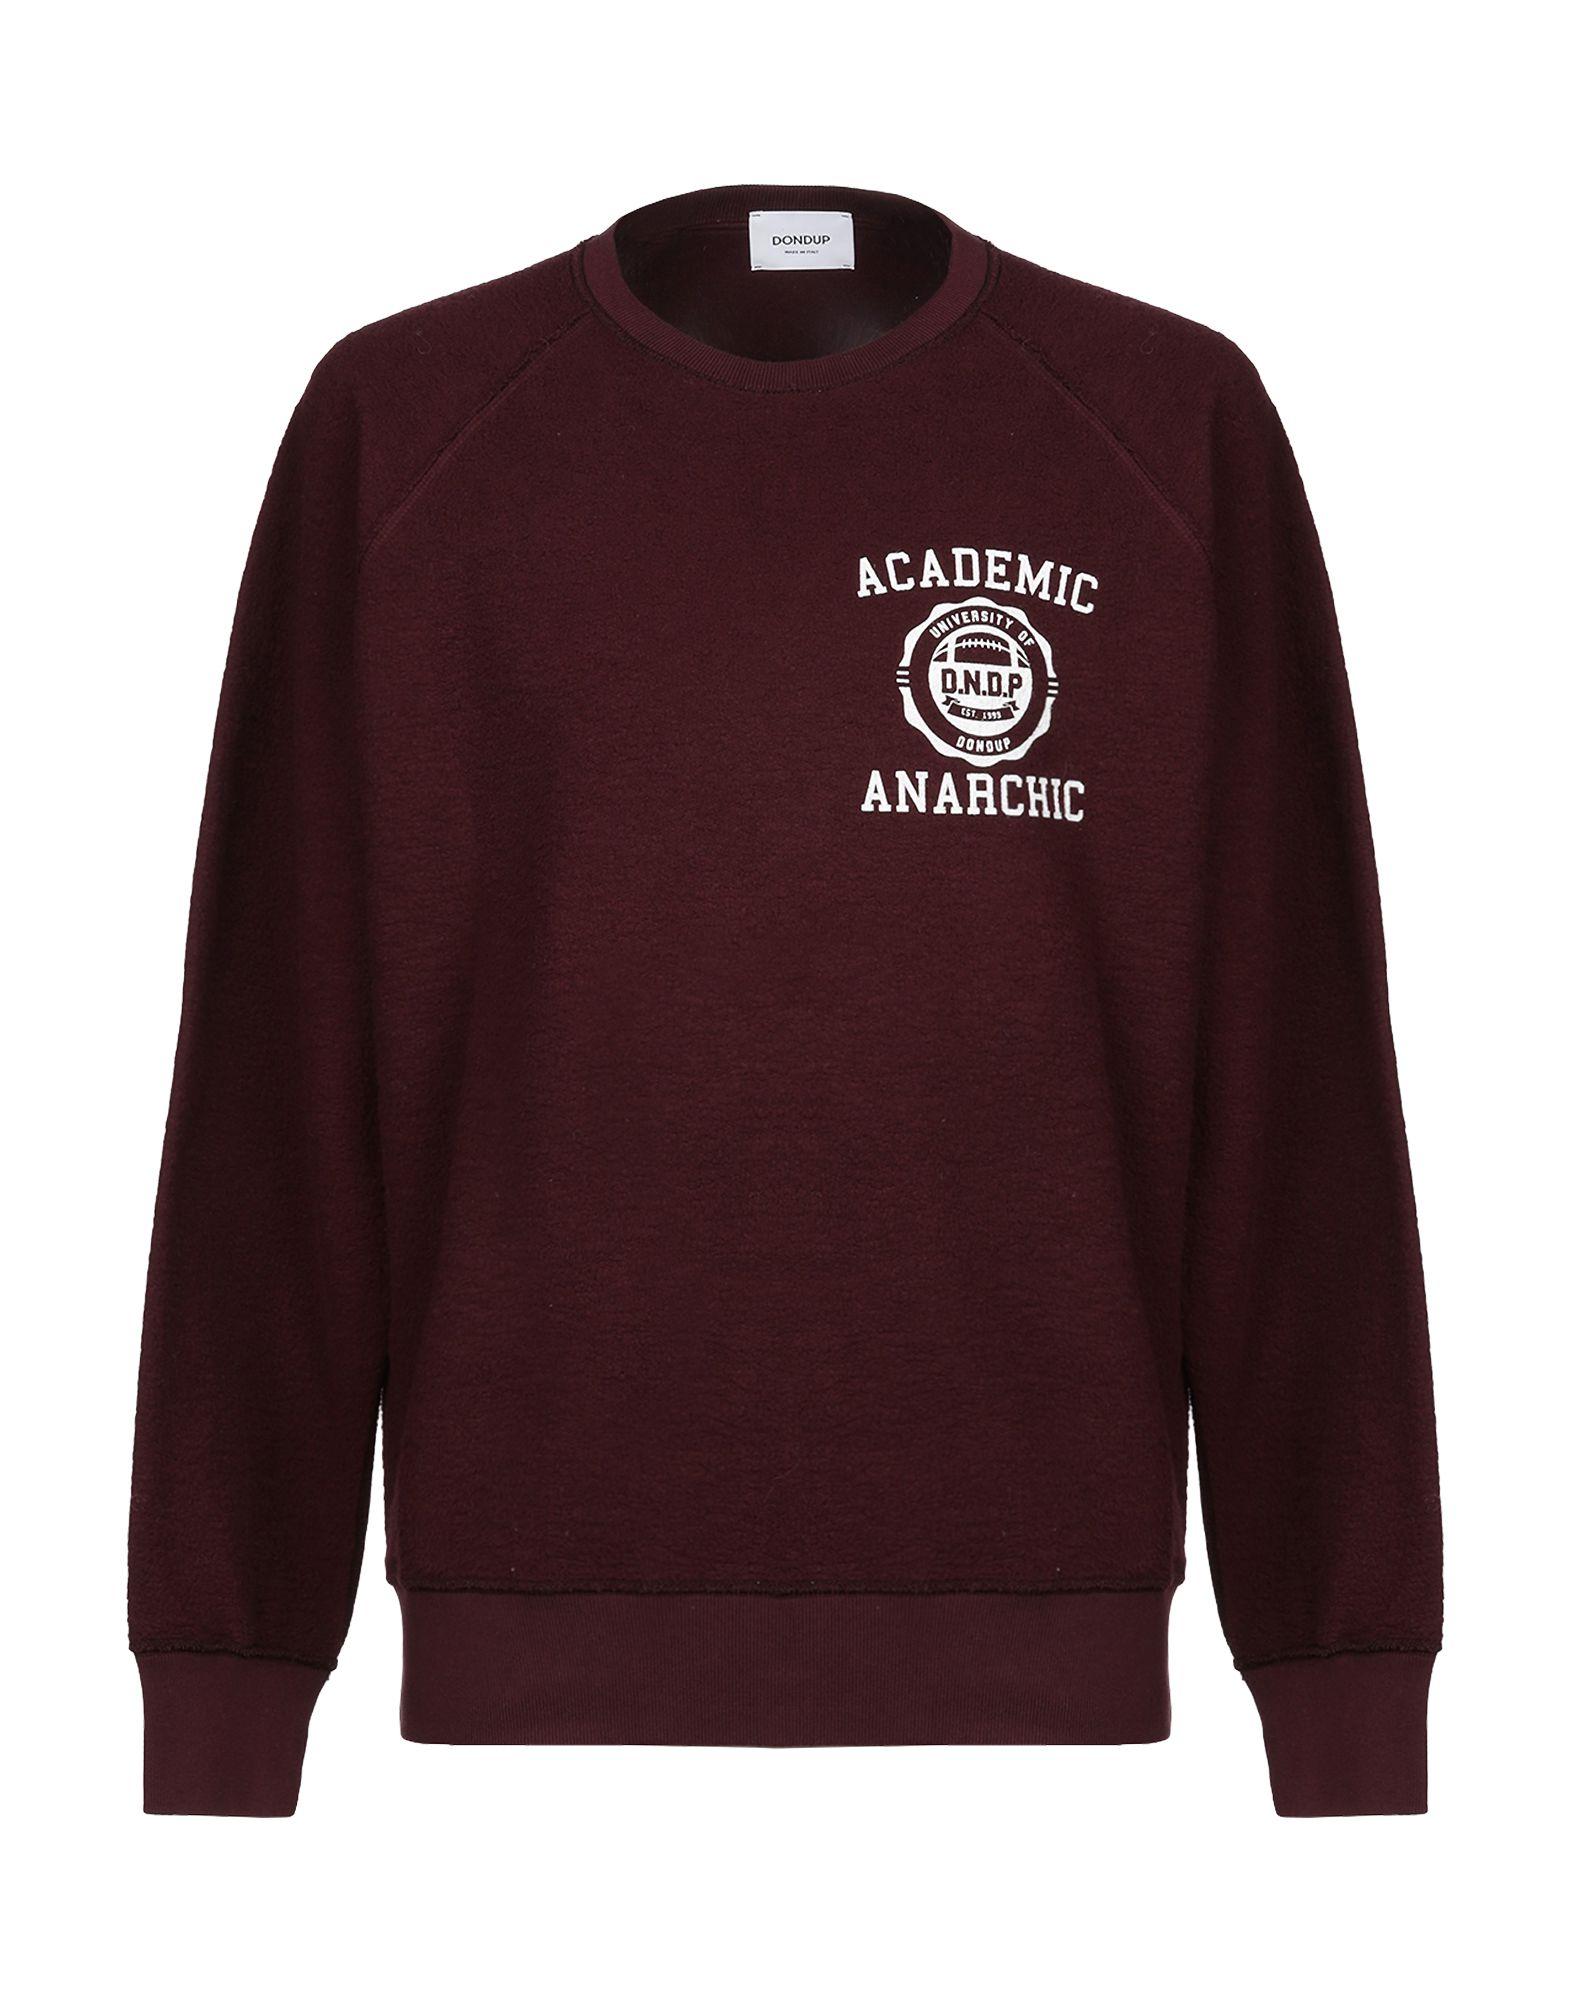 DONDUP Sweatshirts. logo, print, solid color, round collar, long sleeves, no pockets, fleece lining. 100% Cotton